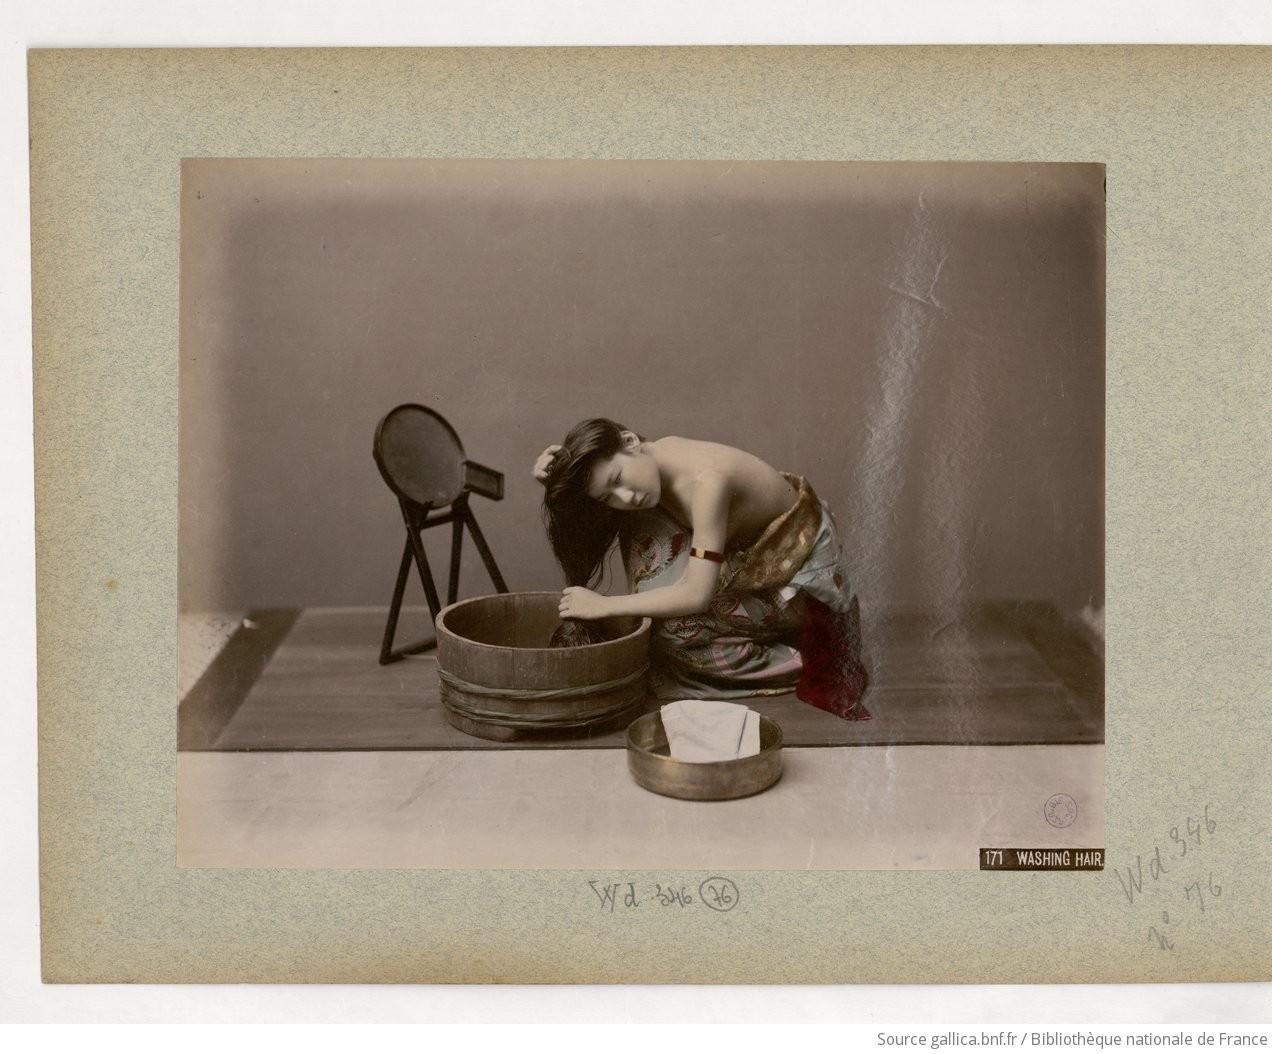 Fig. 76. 171 Washing hair;